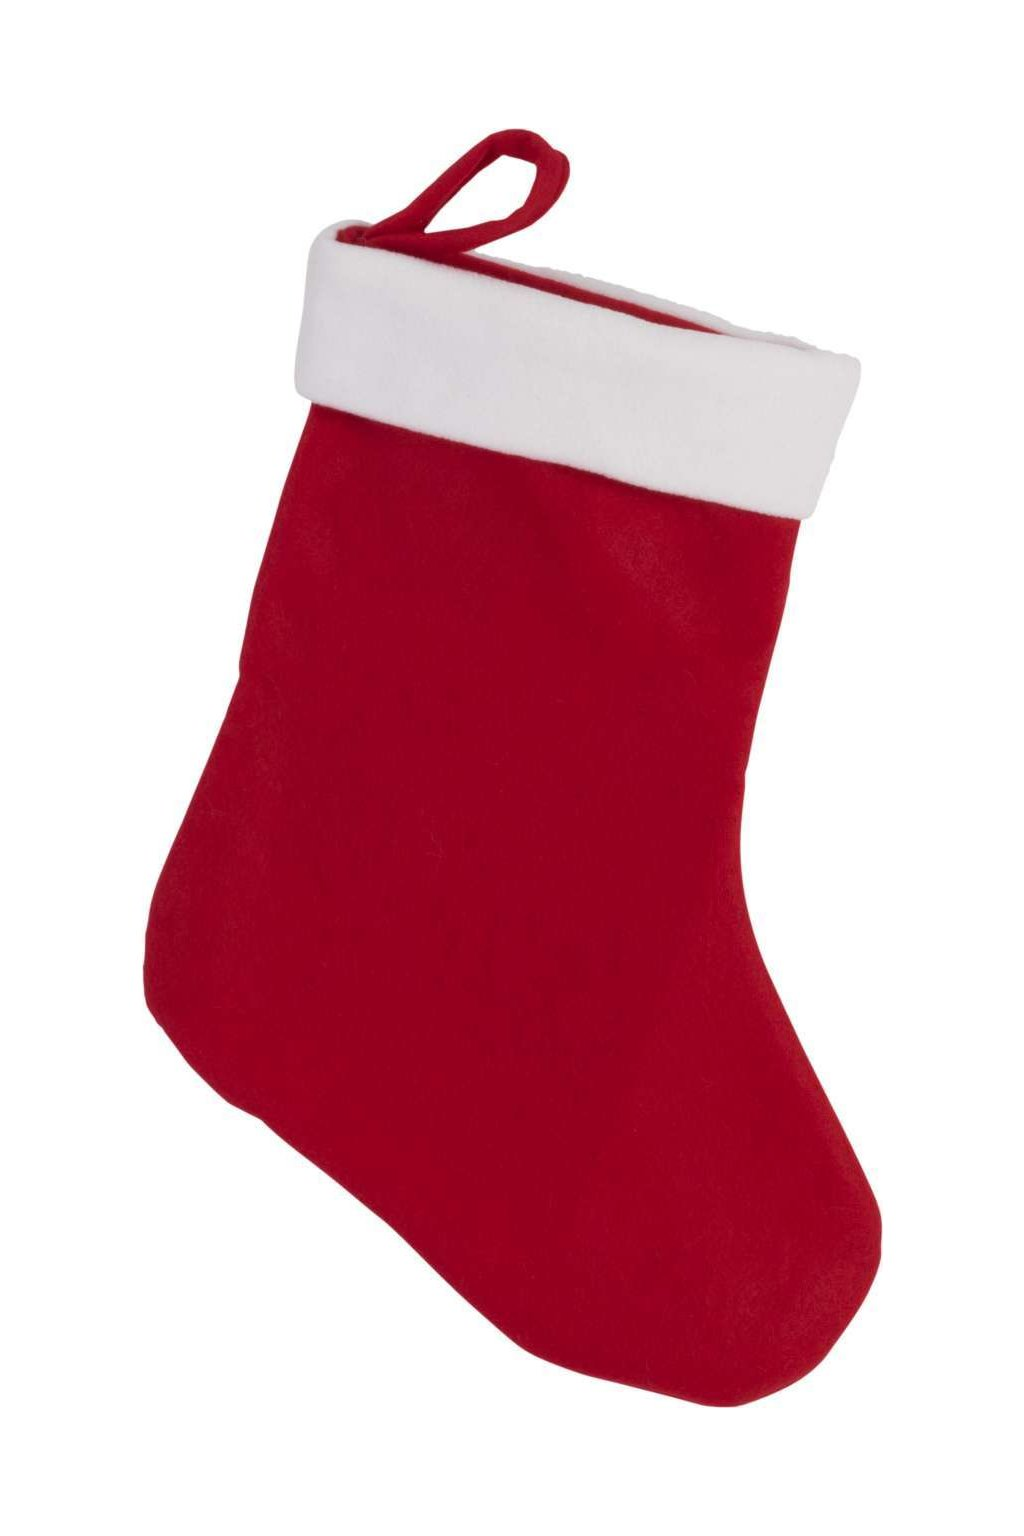 Vánoční punčocha Santa Claus